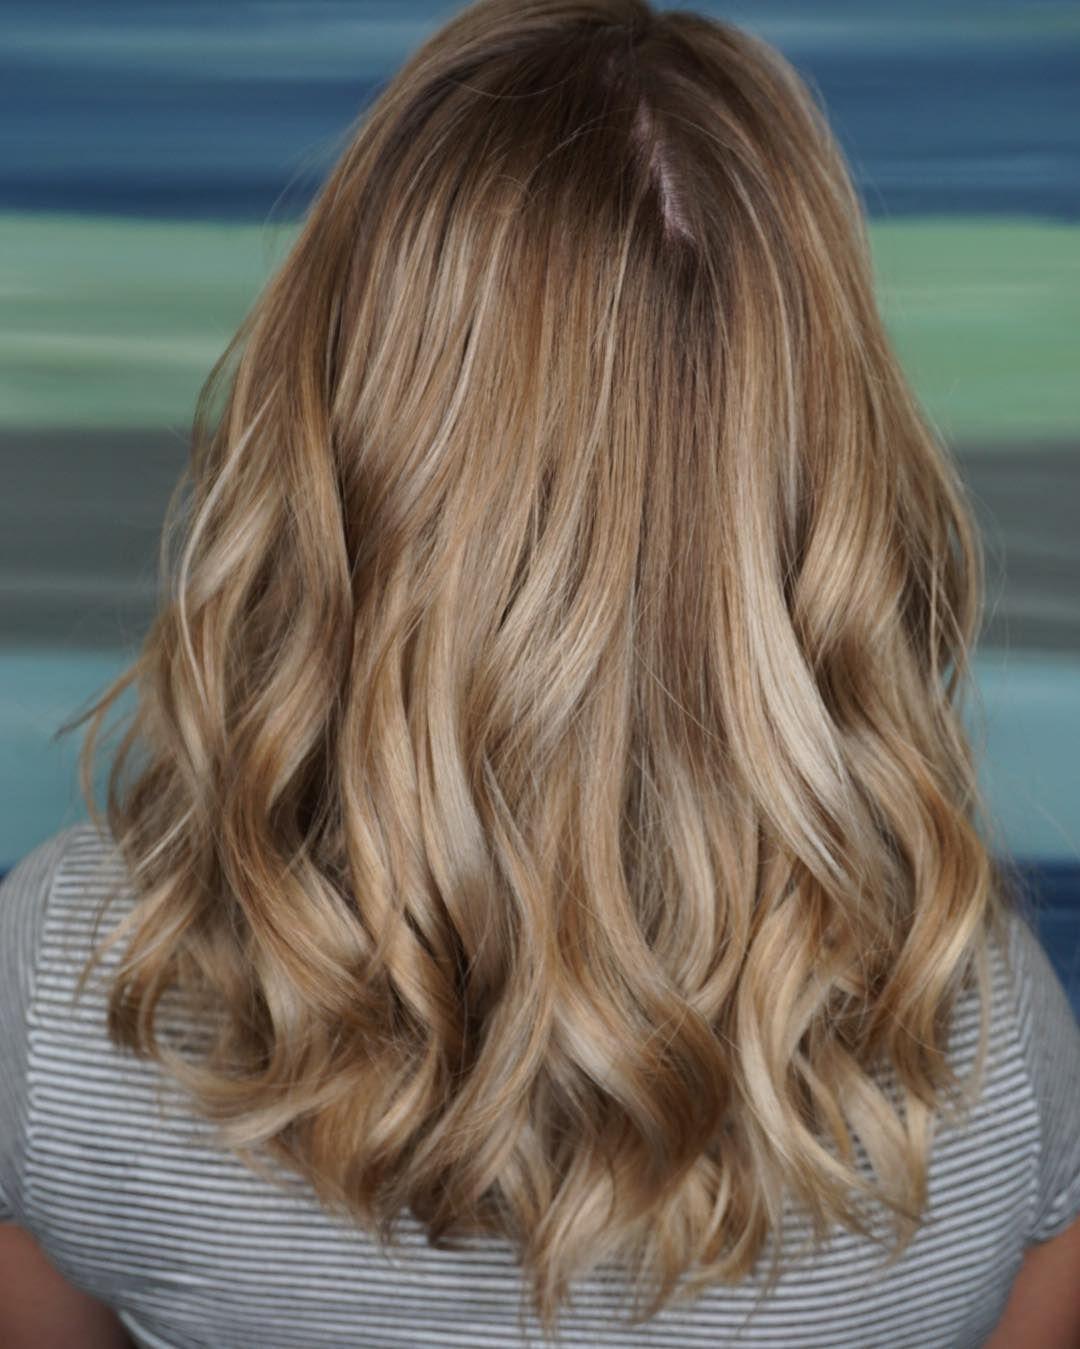 Multi Tonal Blonde ˜�️blonde ˜�️blonde☀️ I Love The Soft